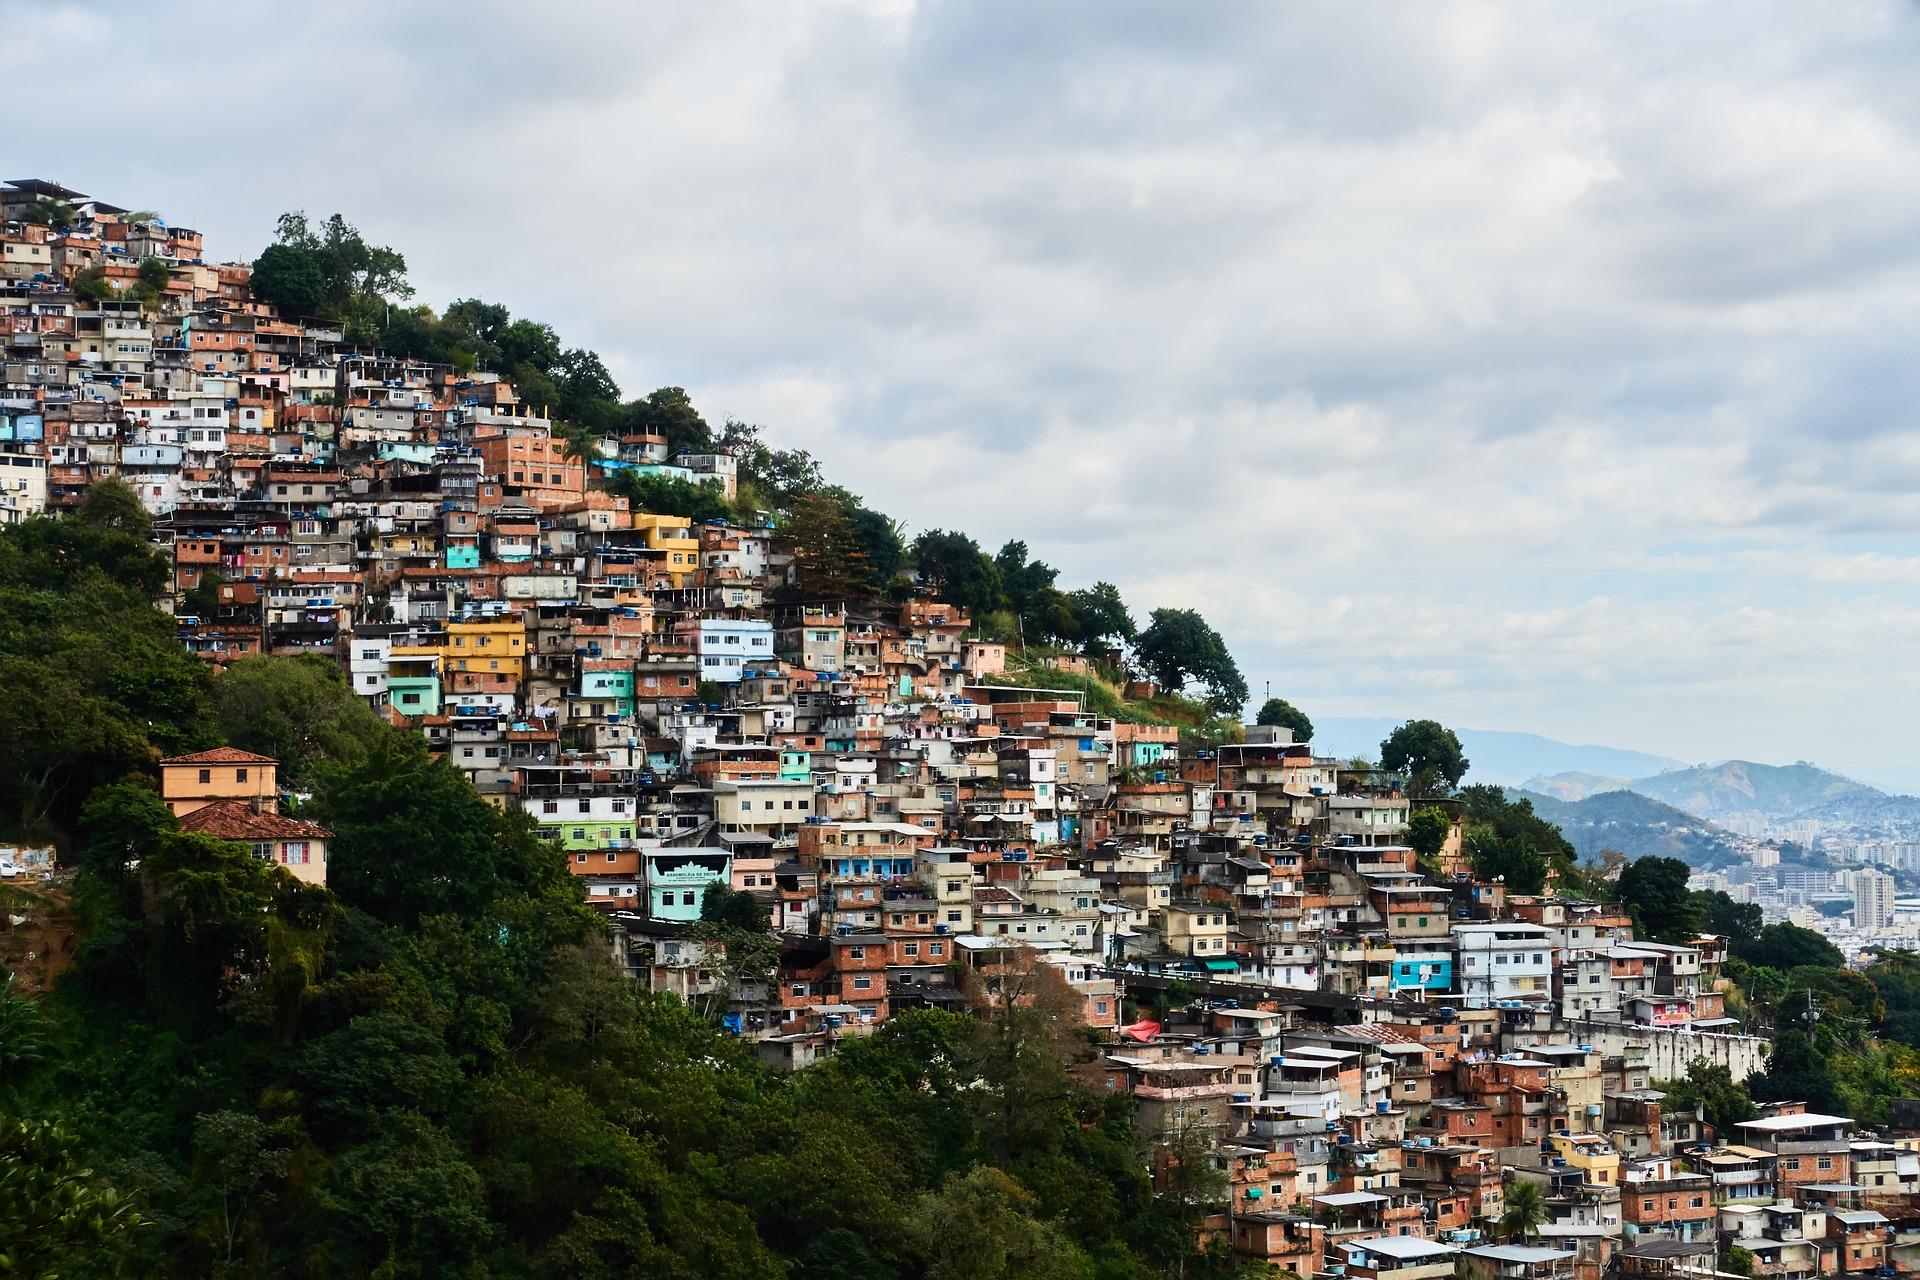 Viviendas informales, patrón de urbanización en América Latina